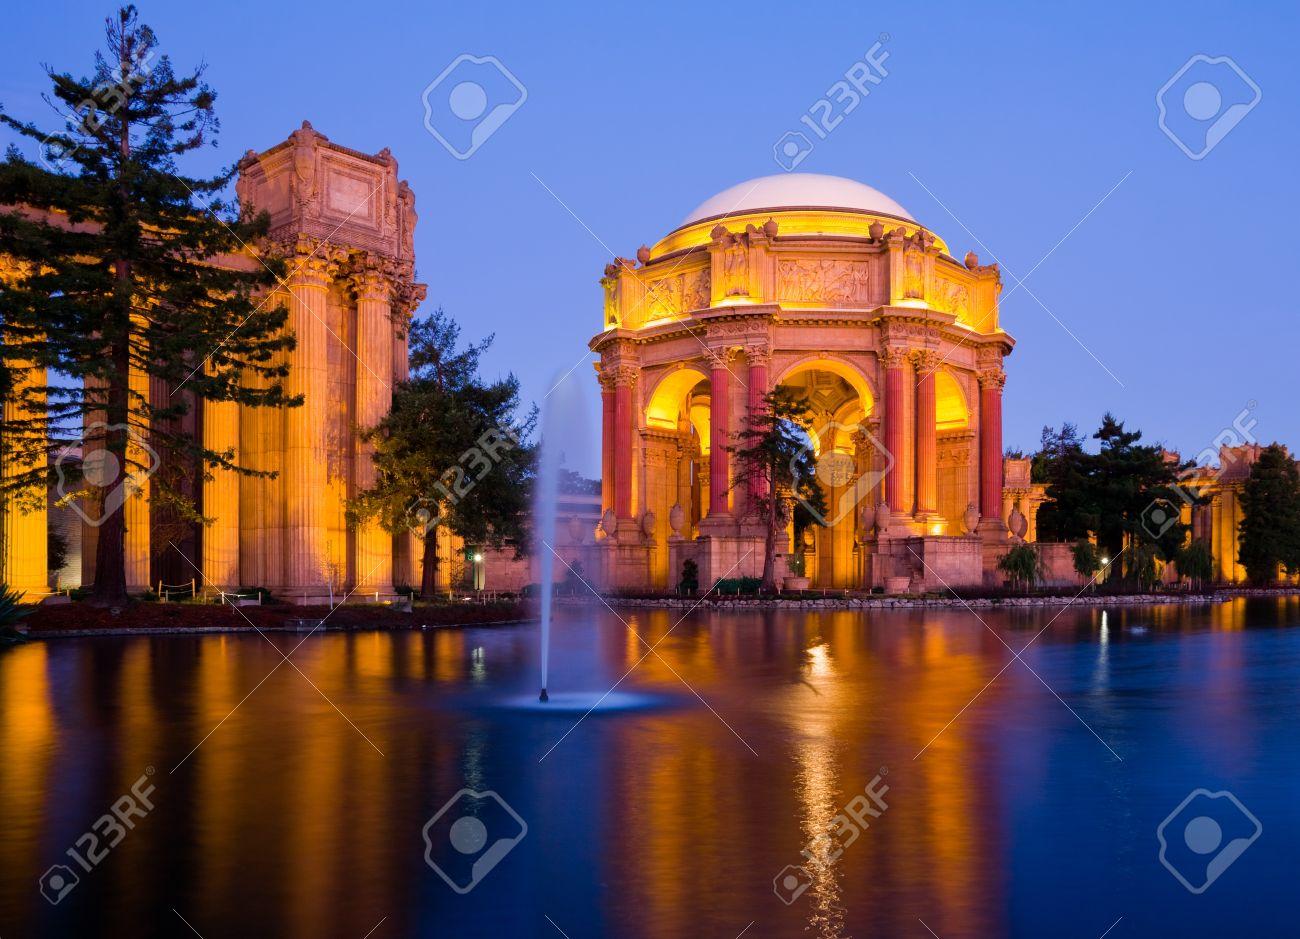 San Francisco Photography 11x14 Framed Palace of Fine Arts at Night